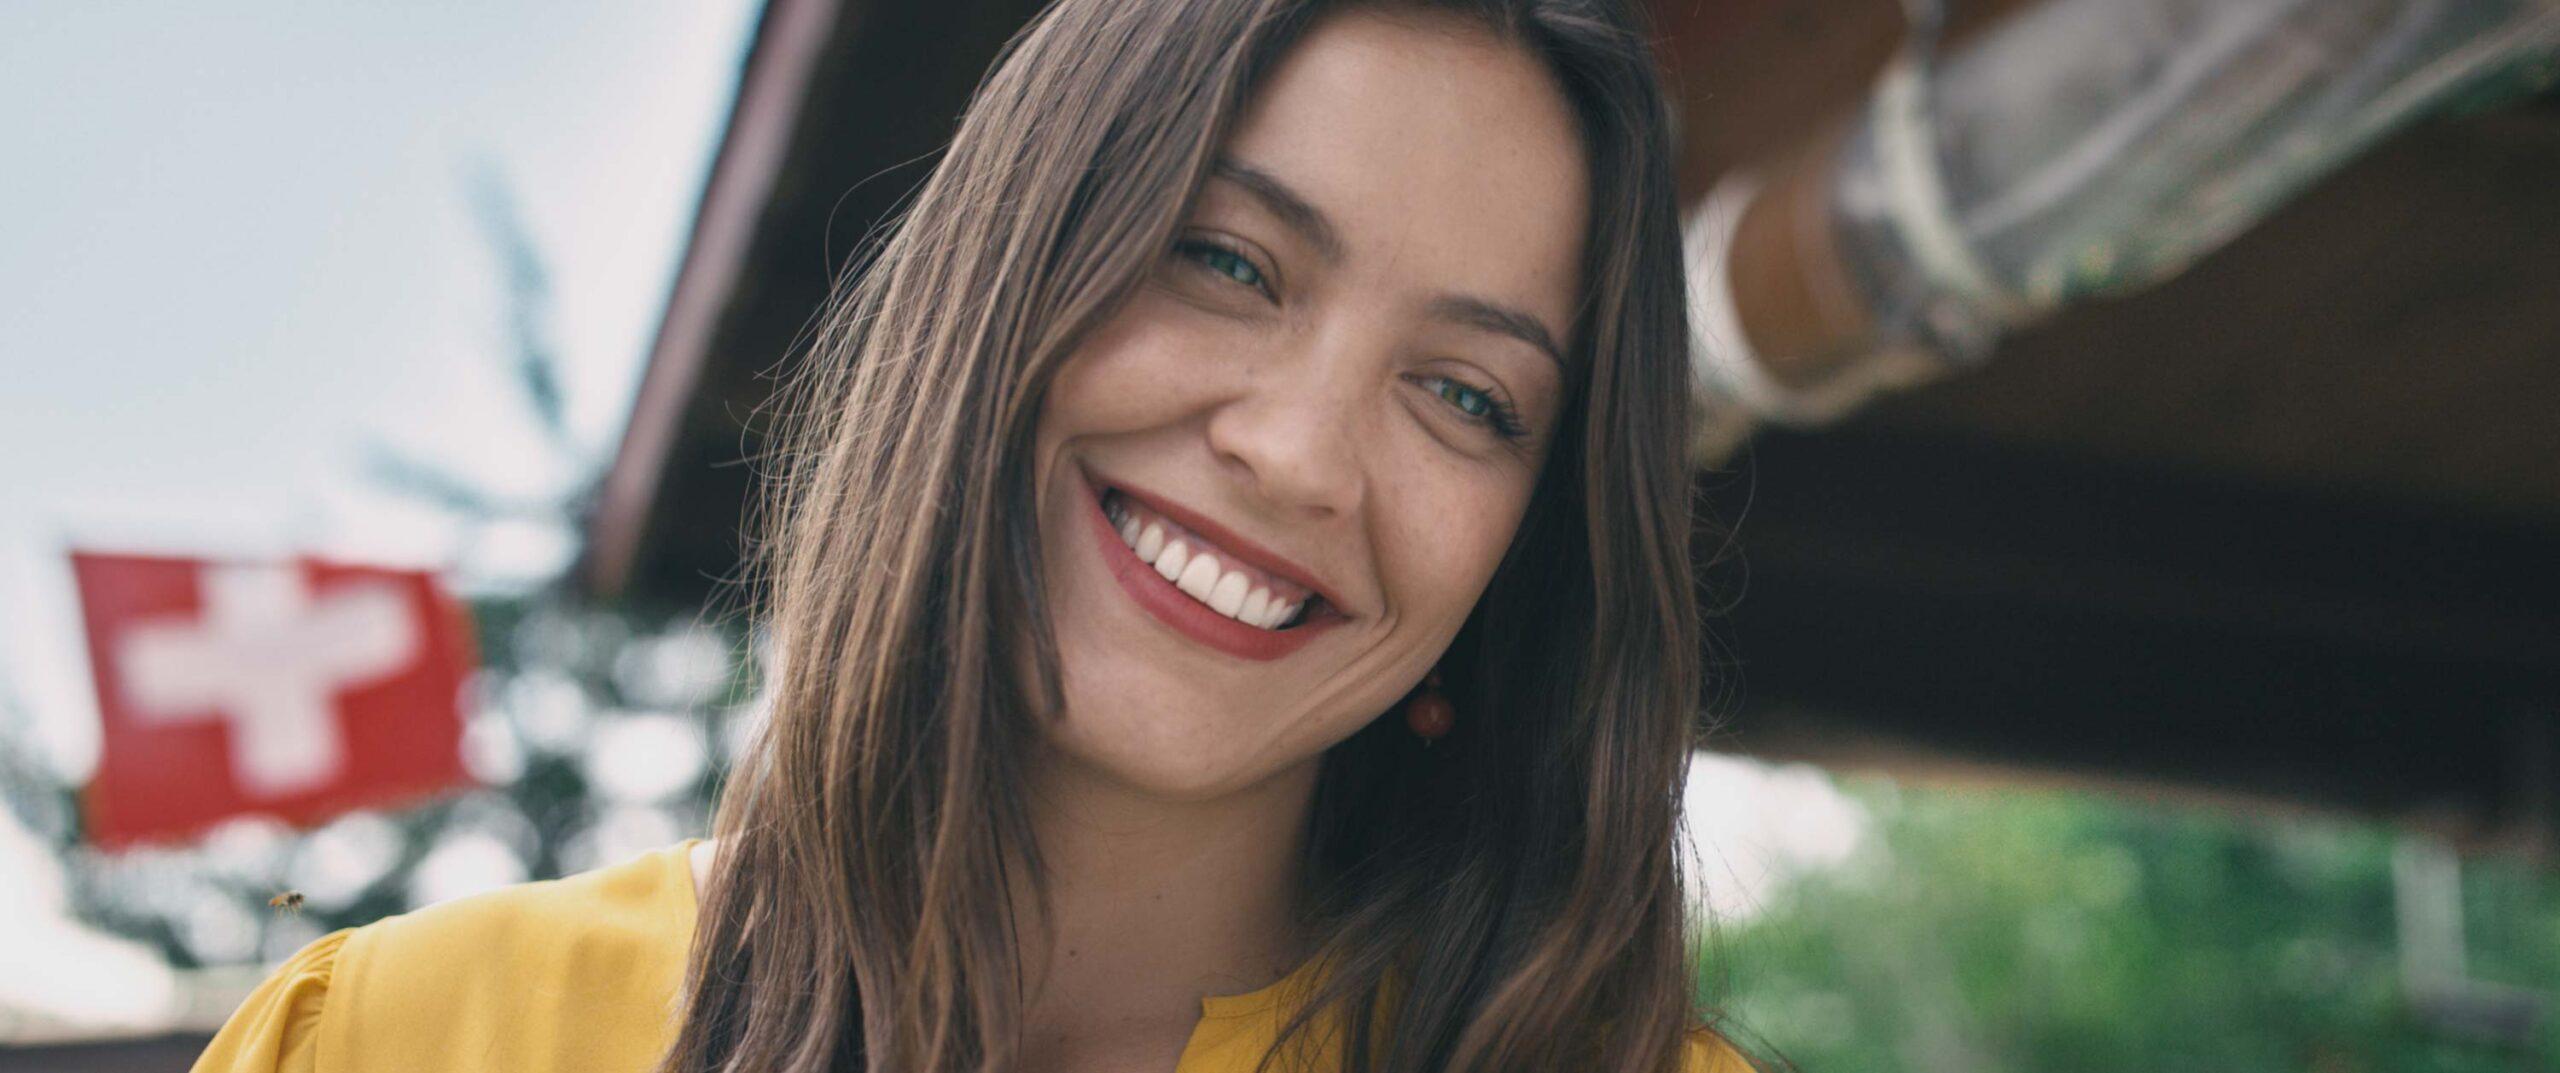 Pünt | female farmer smiling